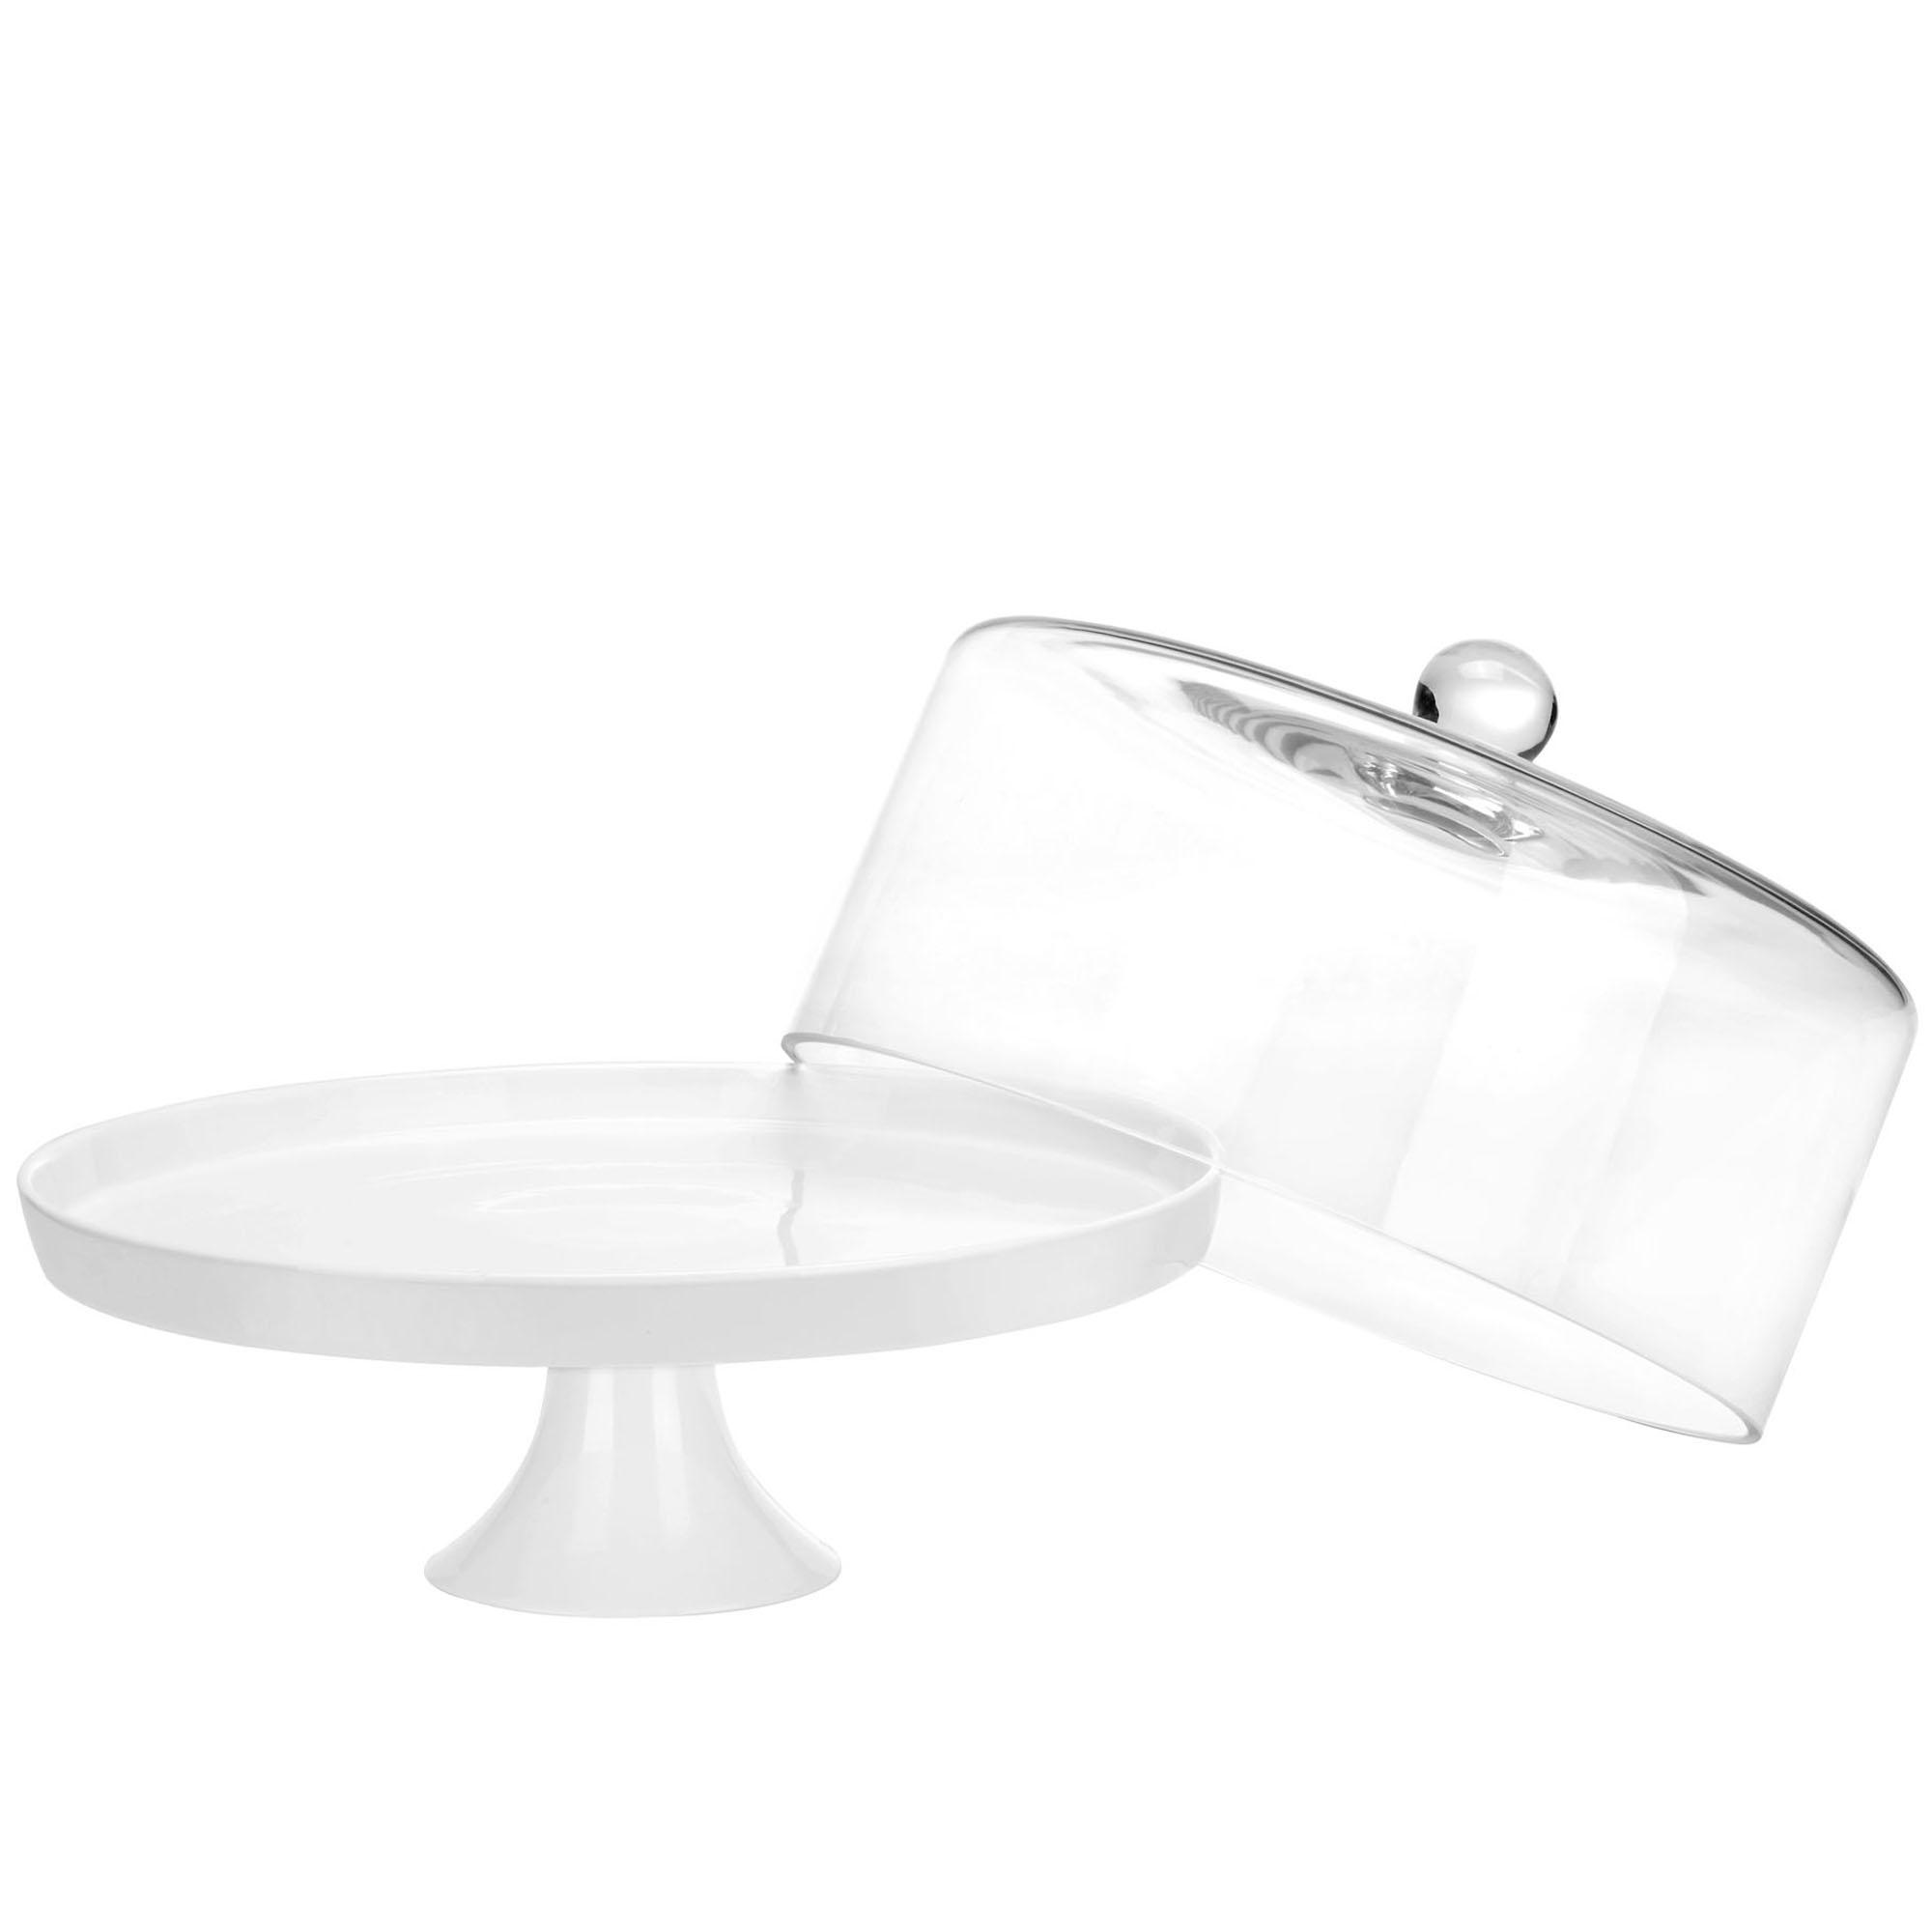 Sentinel Ceramic Cake Stand u0026 Dome  sc 1 st  eBay & VonShef 30cm Cake Cupcake White Ceramic Display Stand with Glass ...